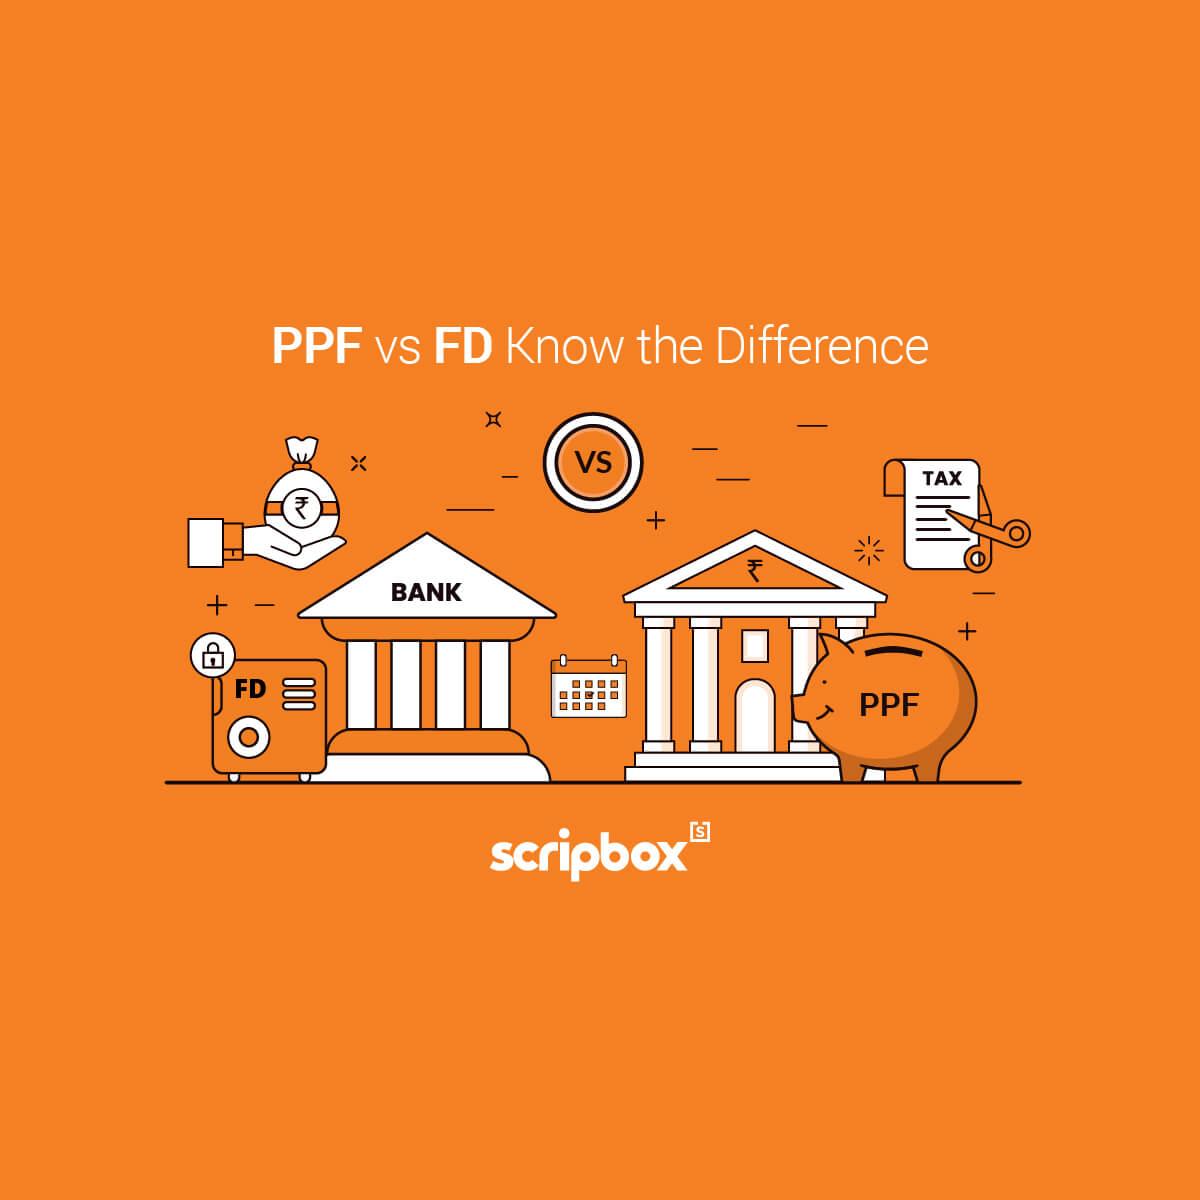 ppf vs fd